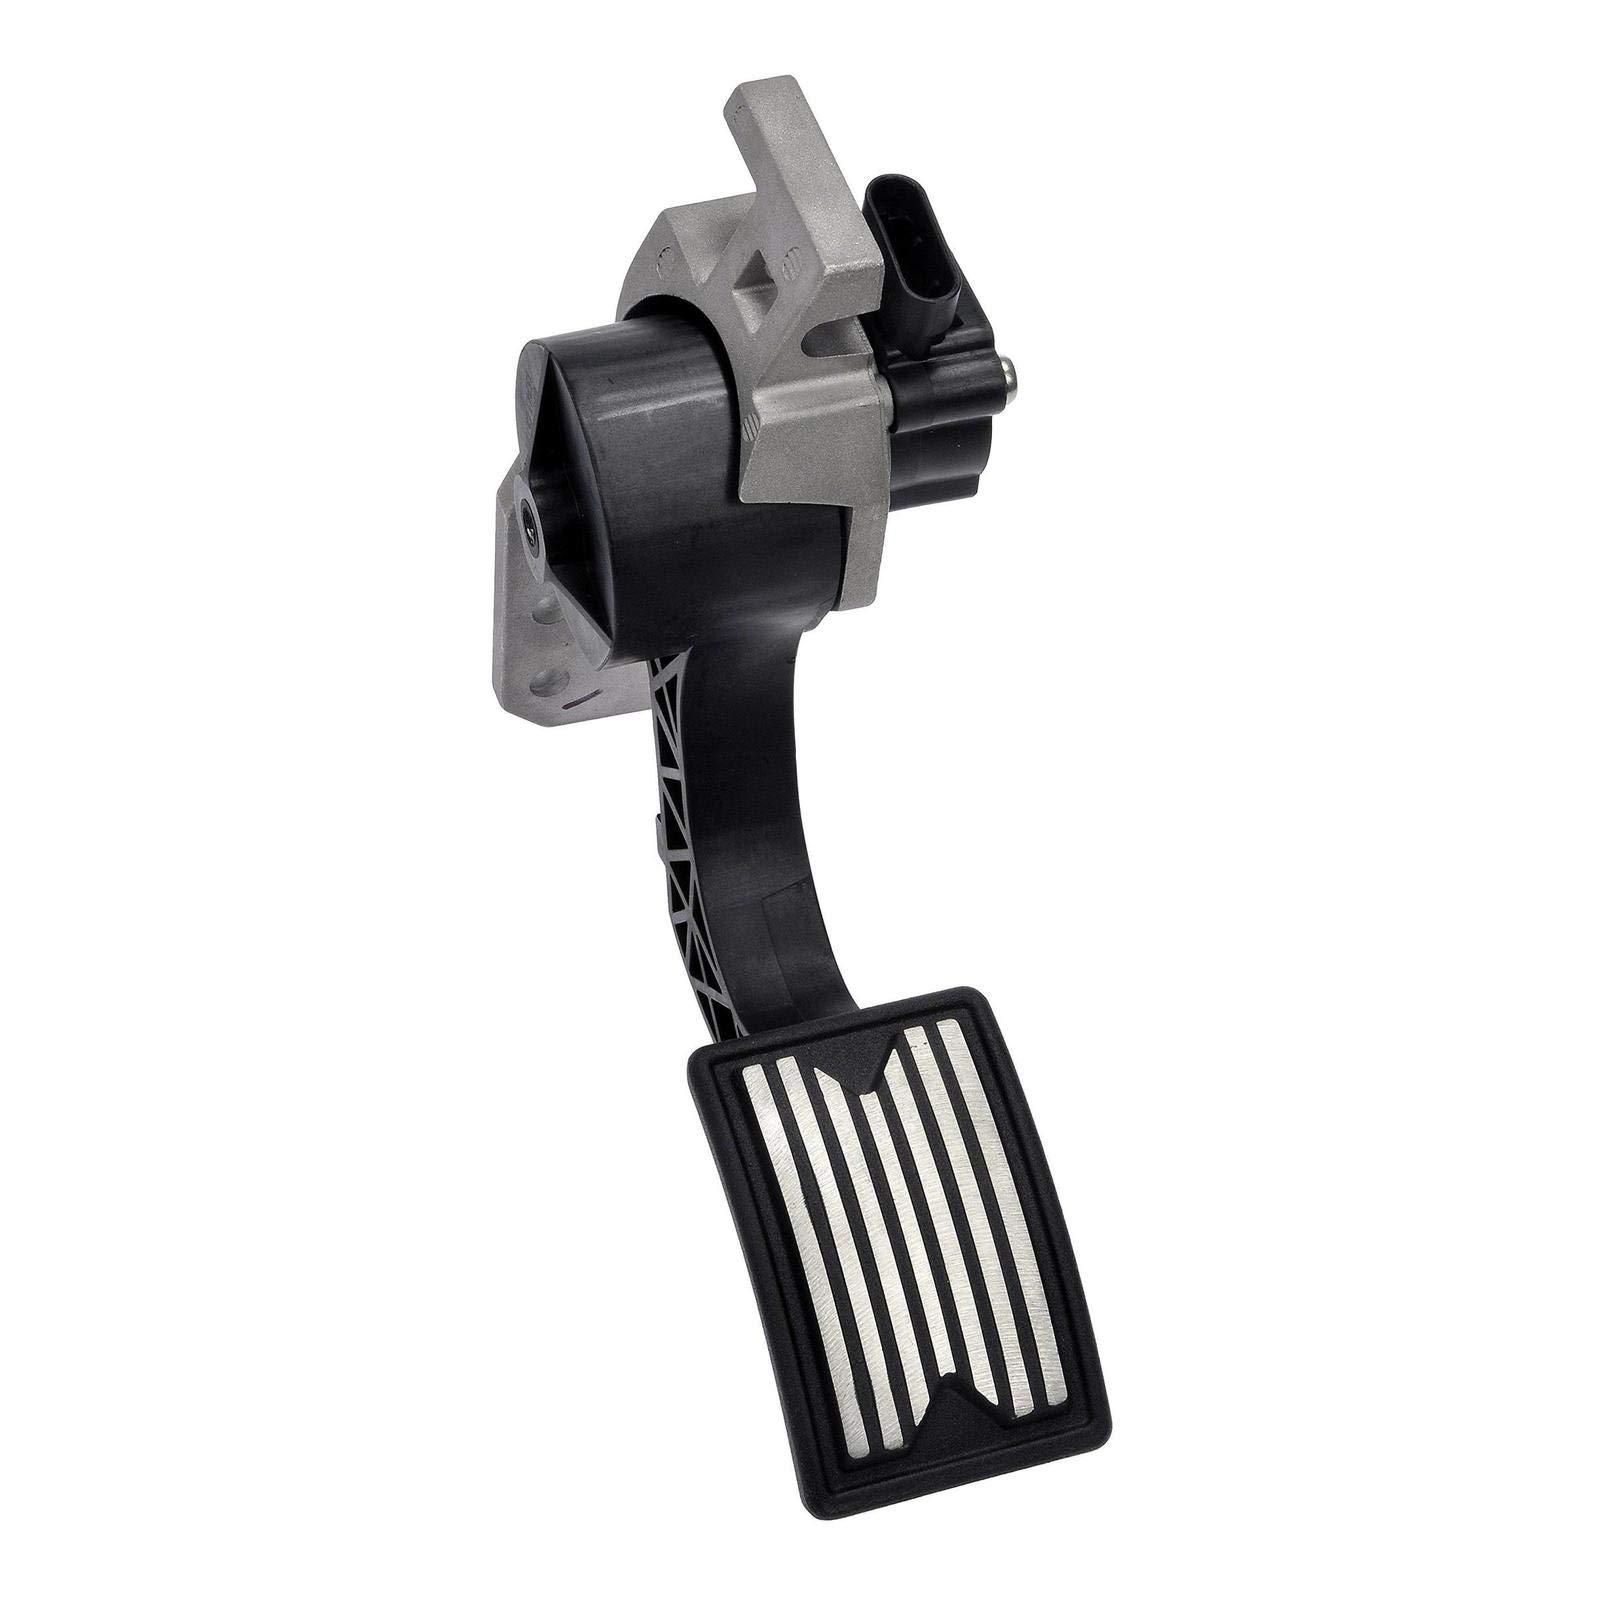 Dorman 699-5501 Accelerator Pedal Assembly